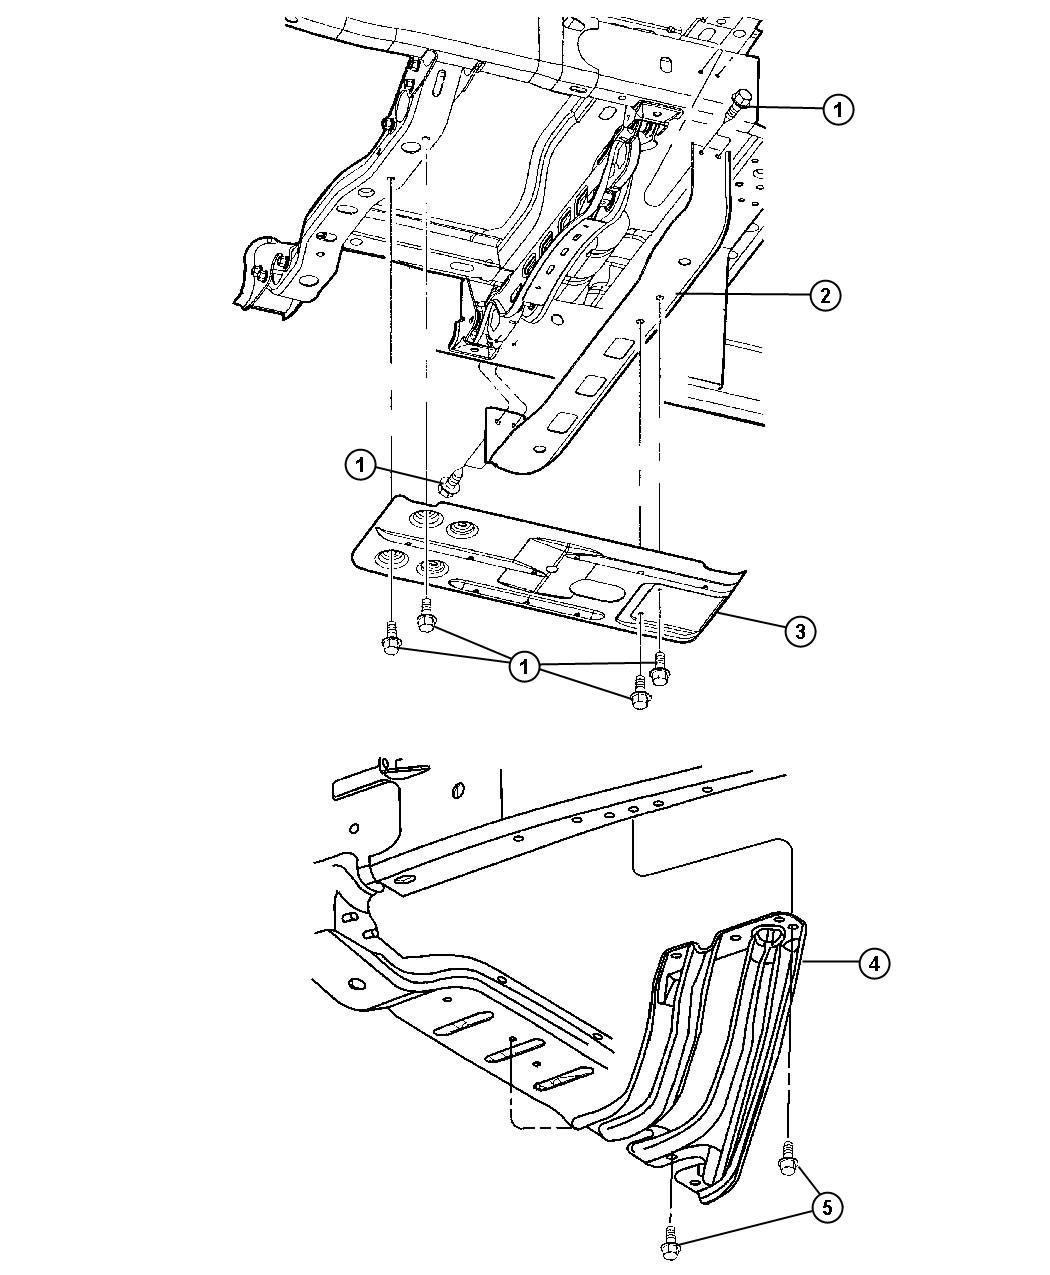 2012 dodge ram 1500 crossmember  mounting  skid plate